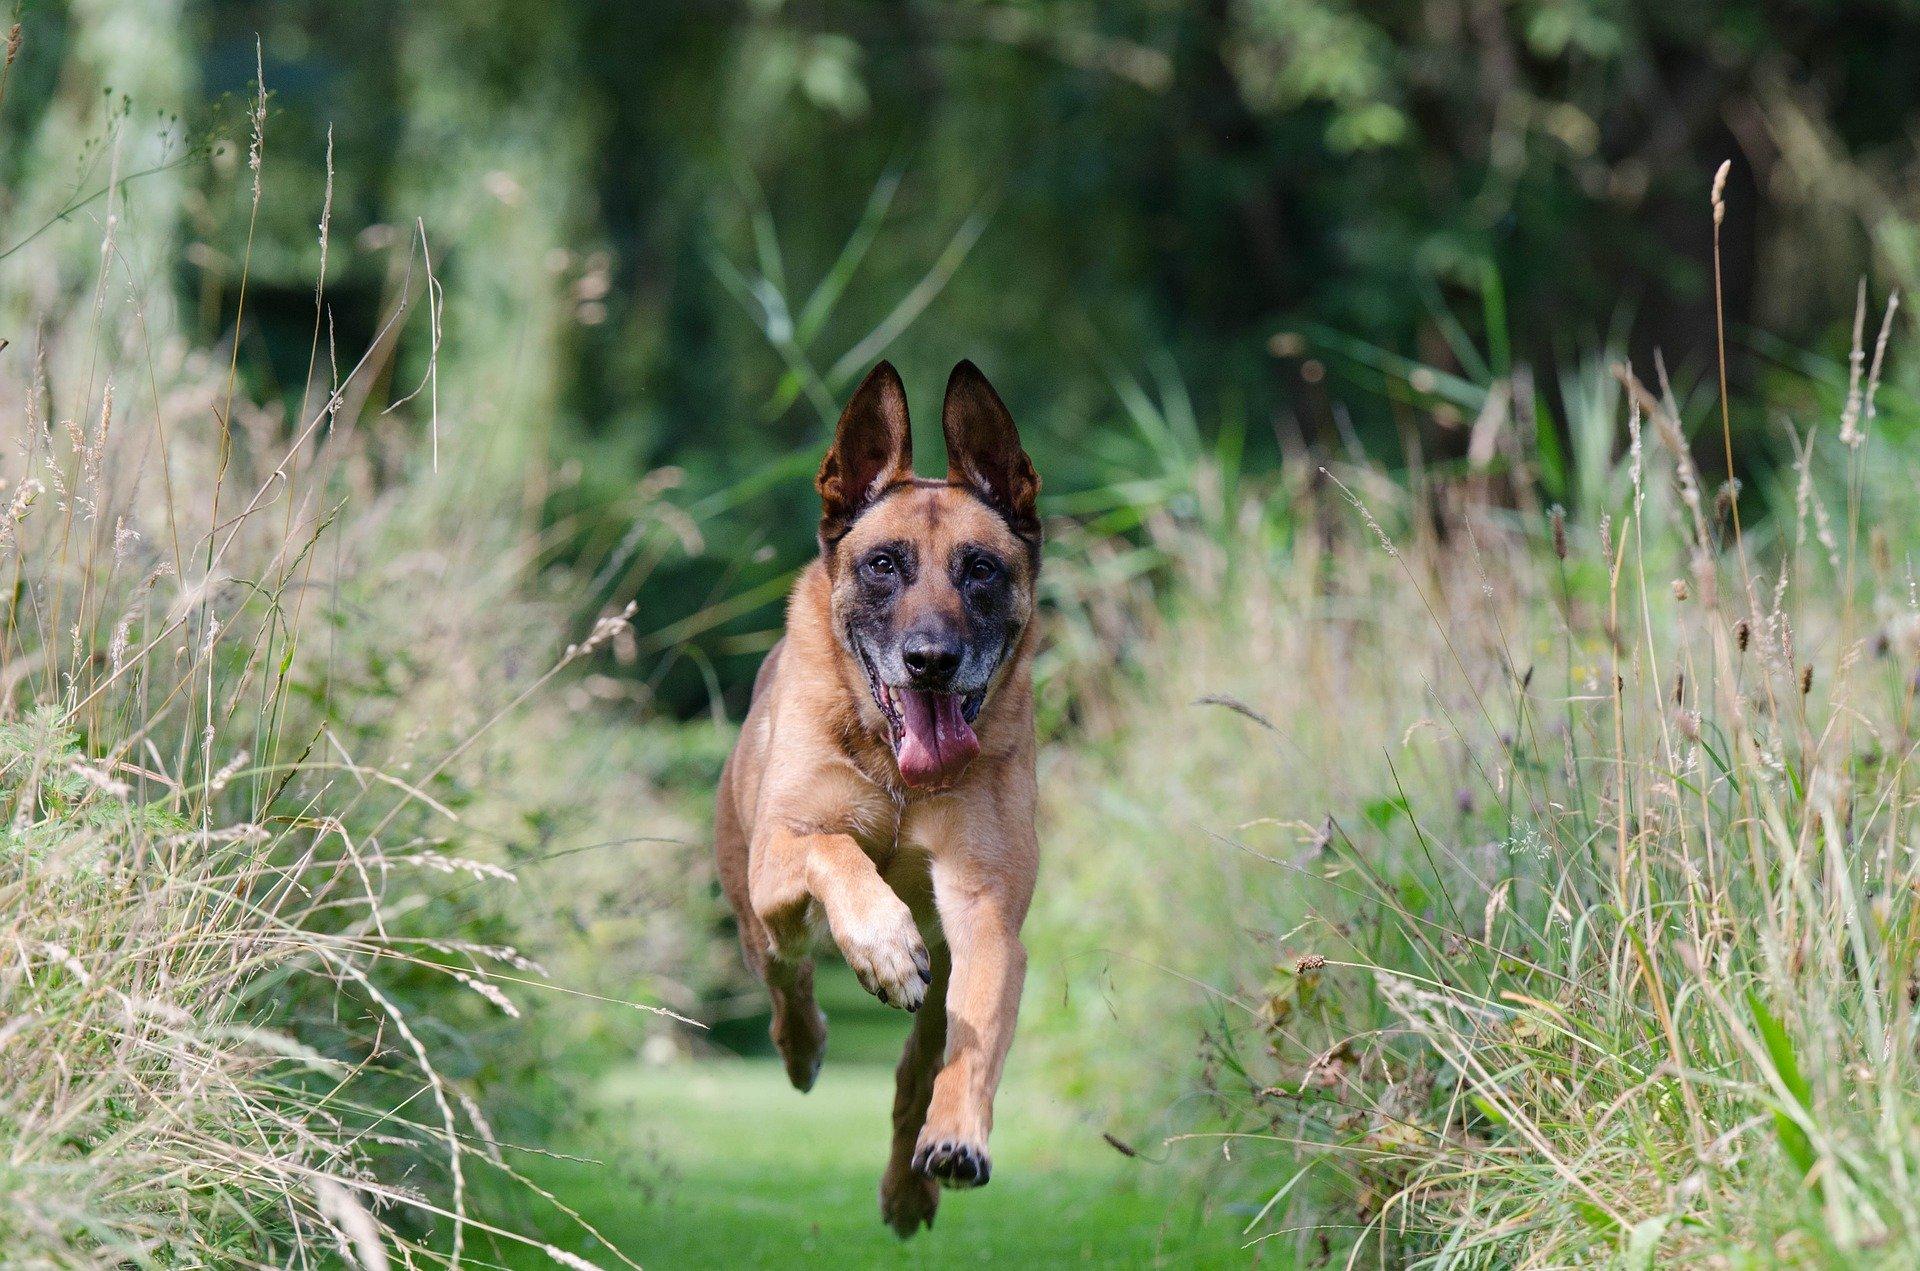 Dog breeds: Belgian Malinois dog, origin and personality